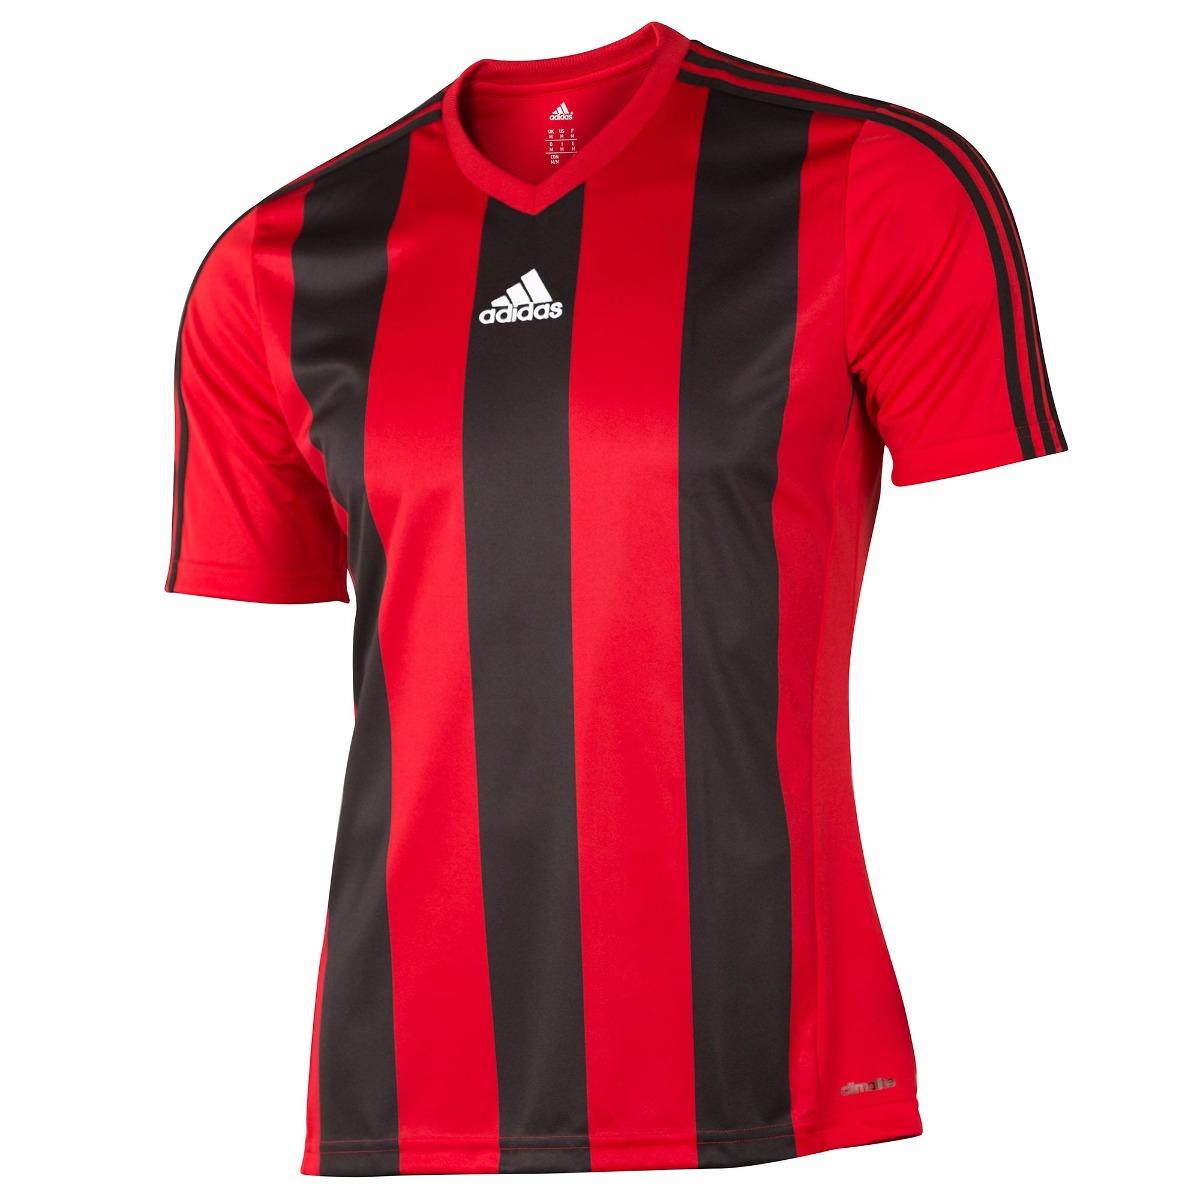 c04f5b5c1482b adidas Camiseta Polera Futbol -   11.990 en Mercado Libre